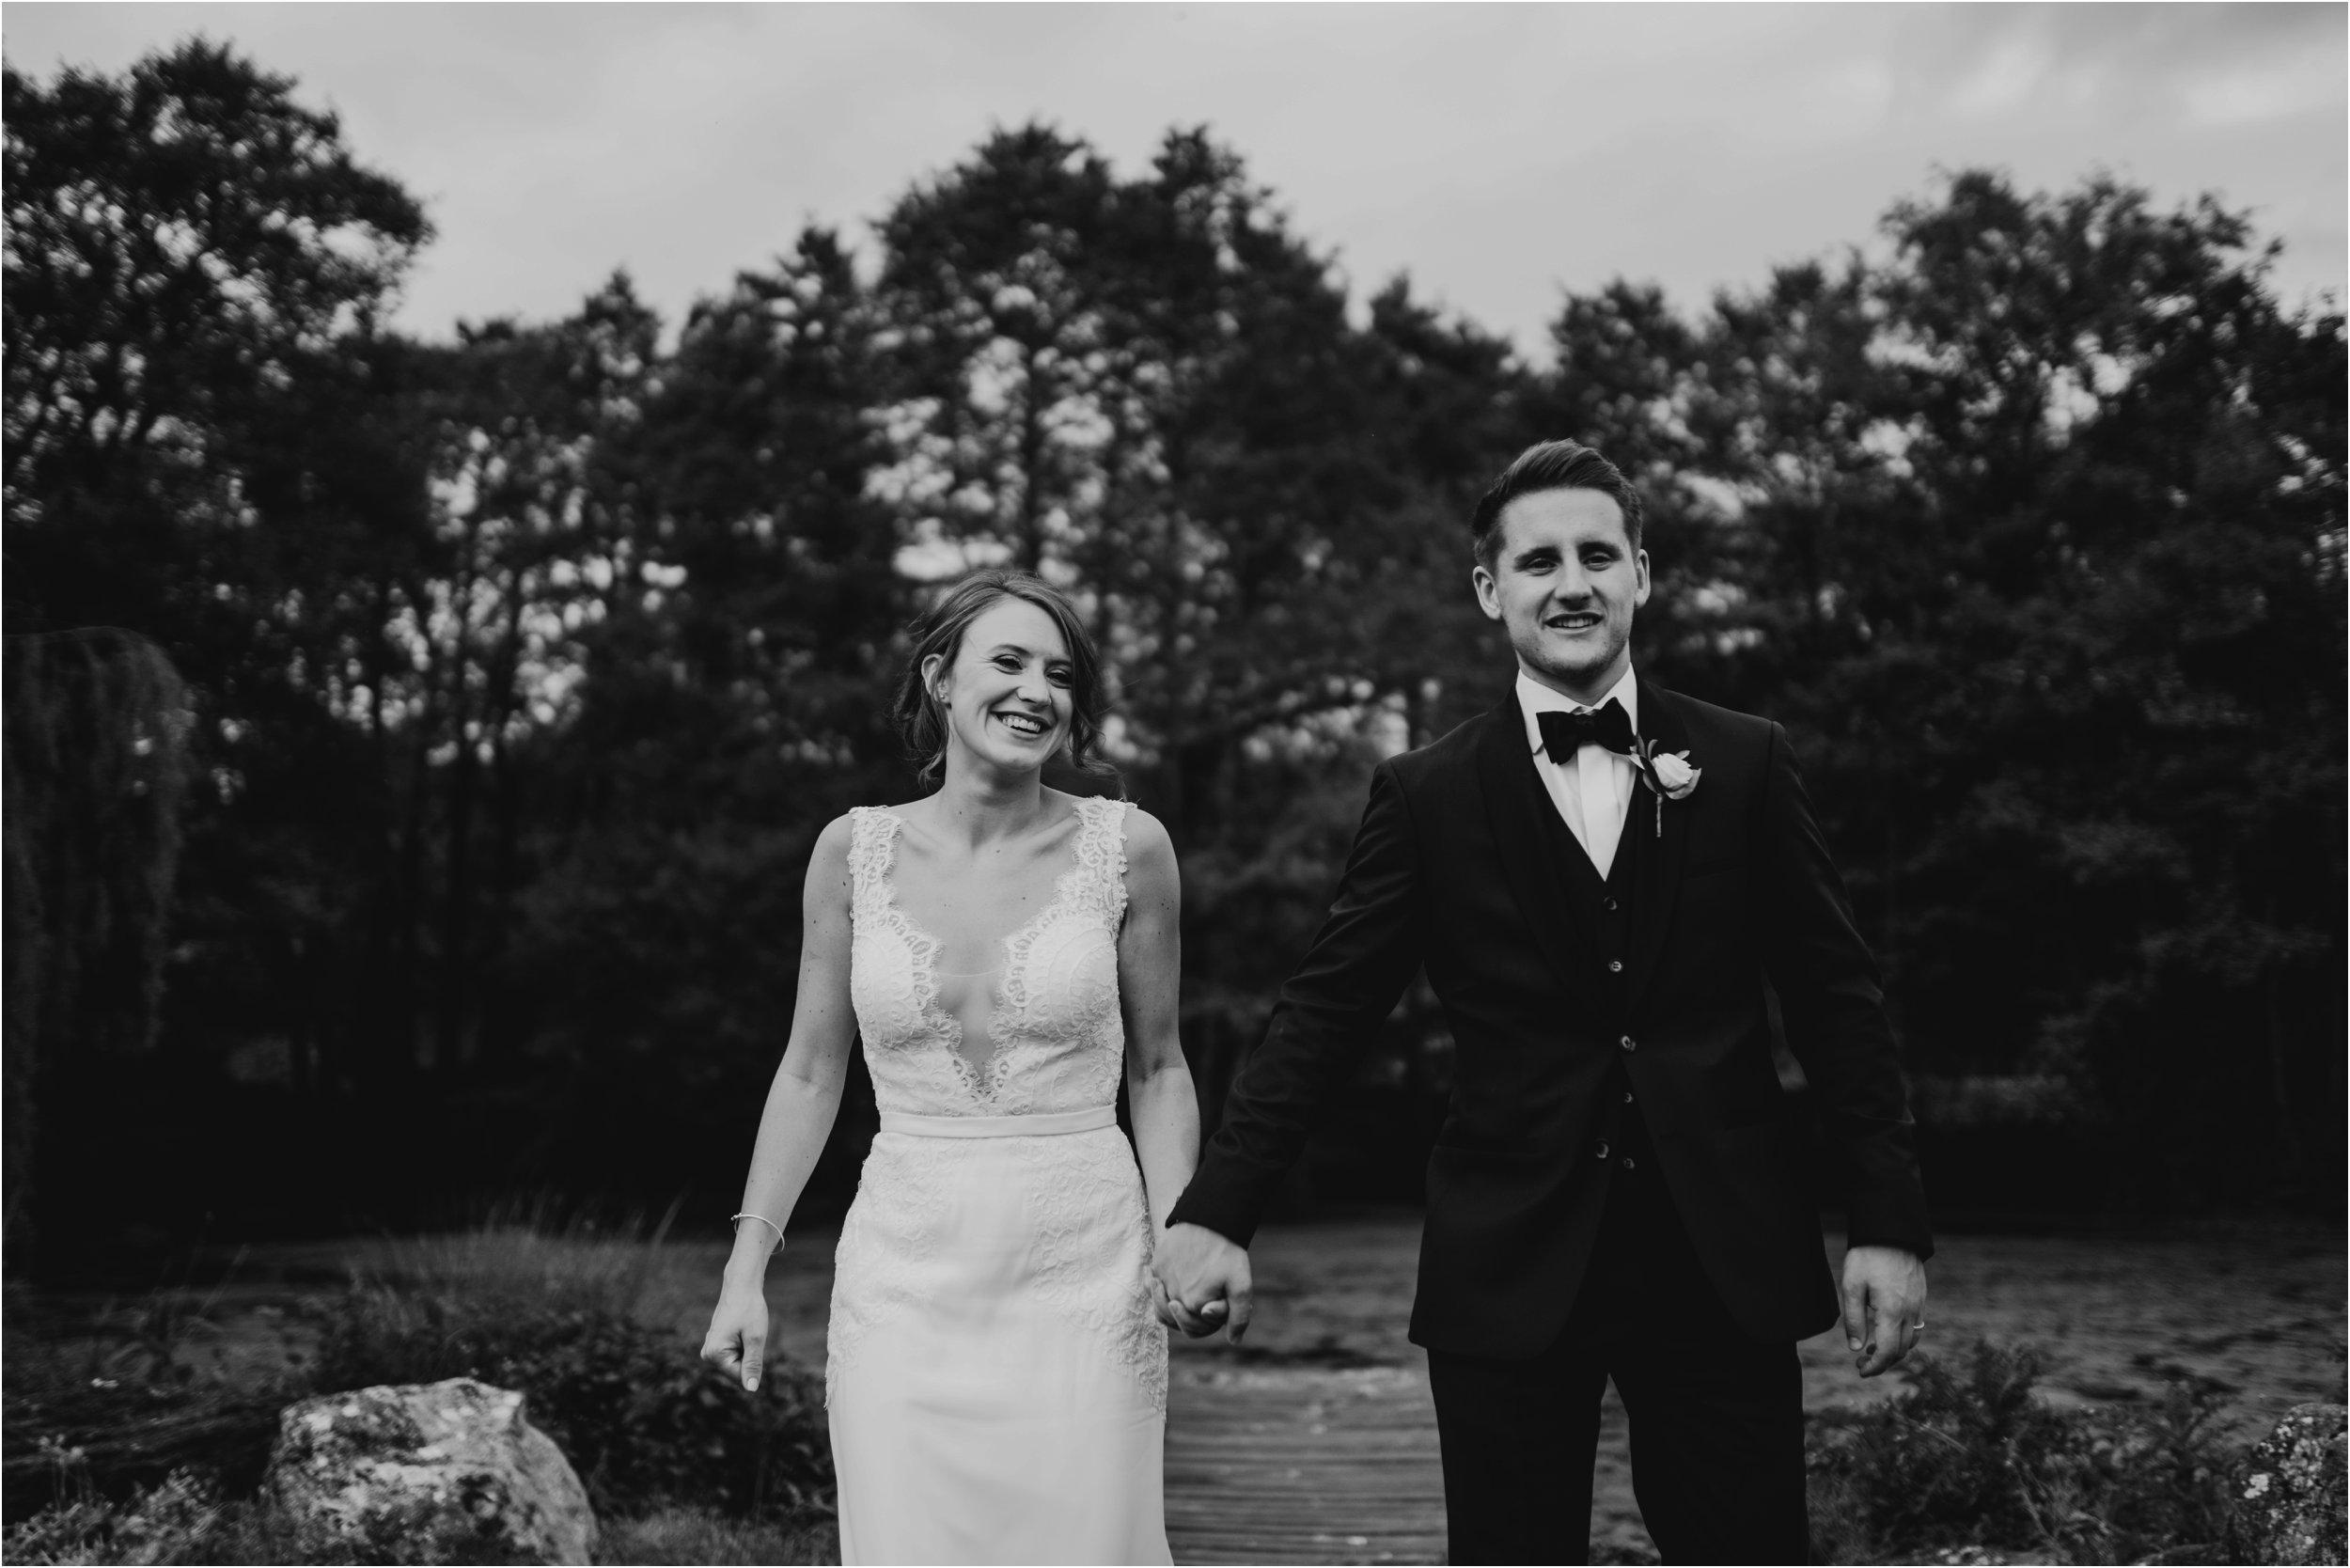 Dewsall Court Herefordshire wedding photographer_0133.jpg